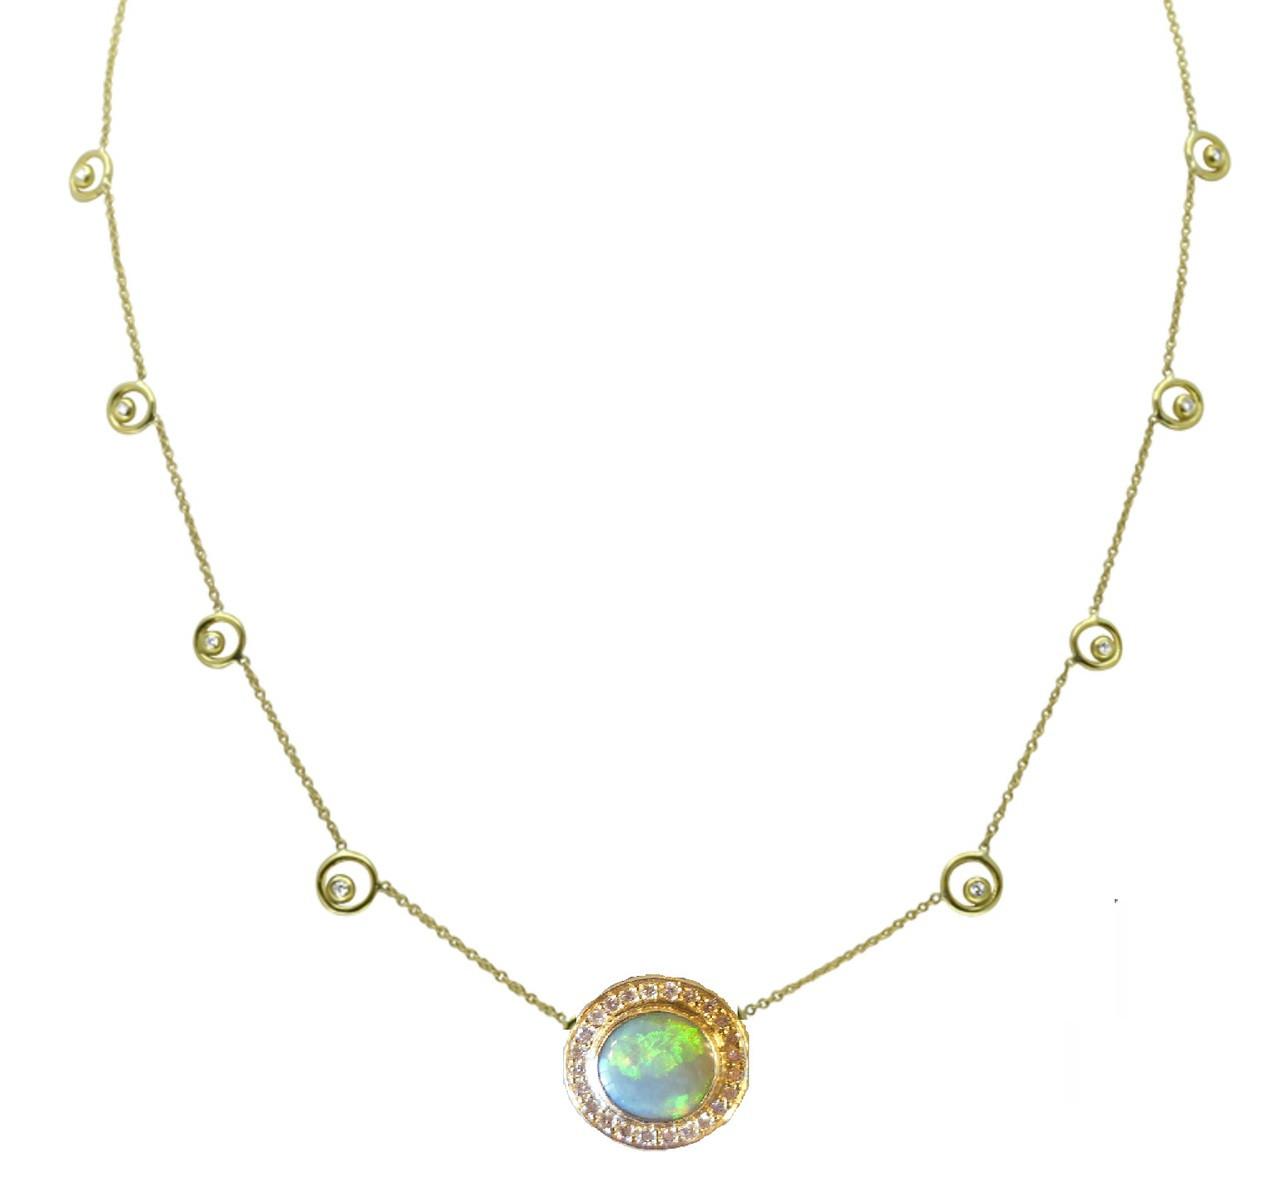 Australian Opal with diamonds on Karma Chain